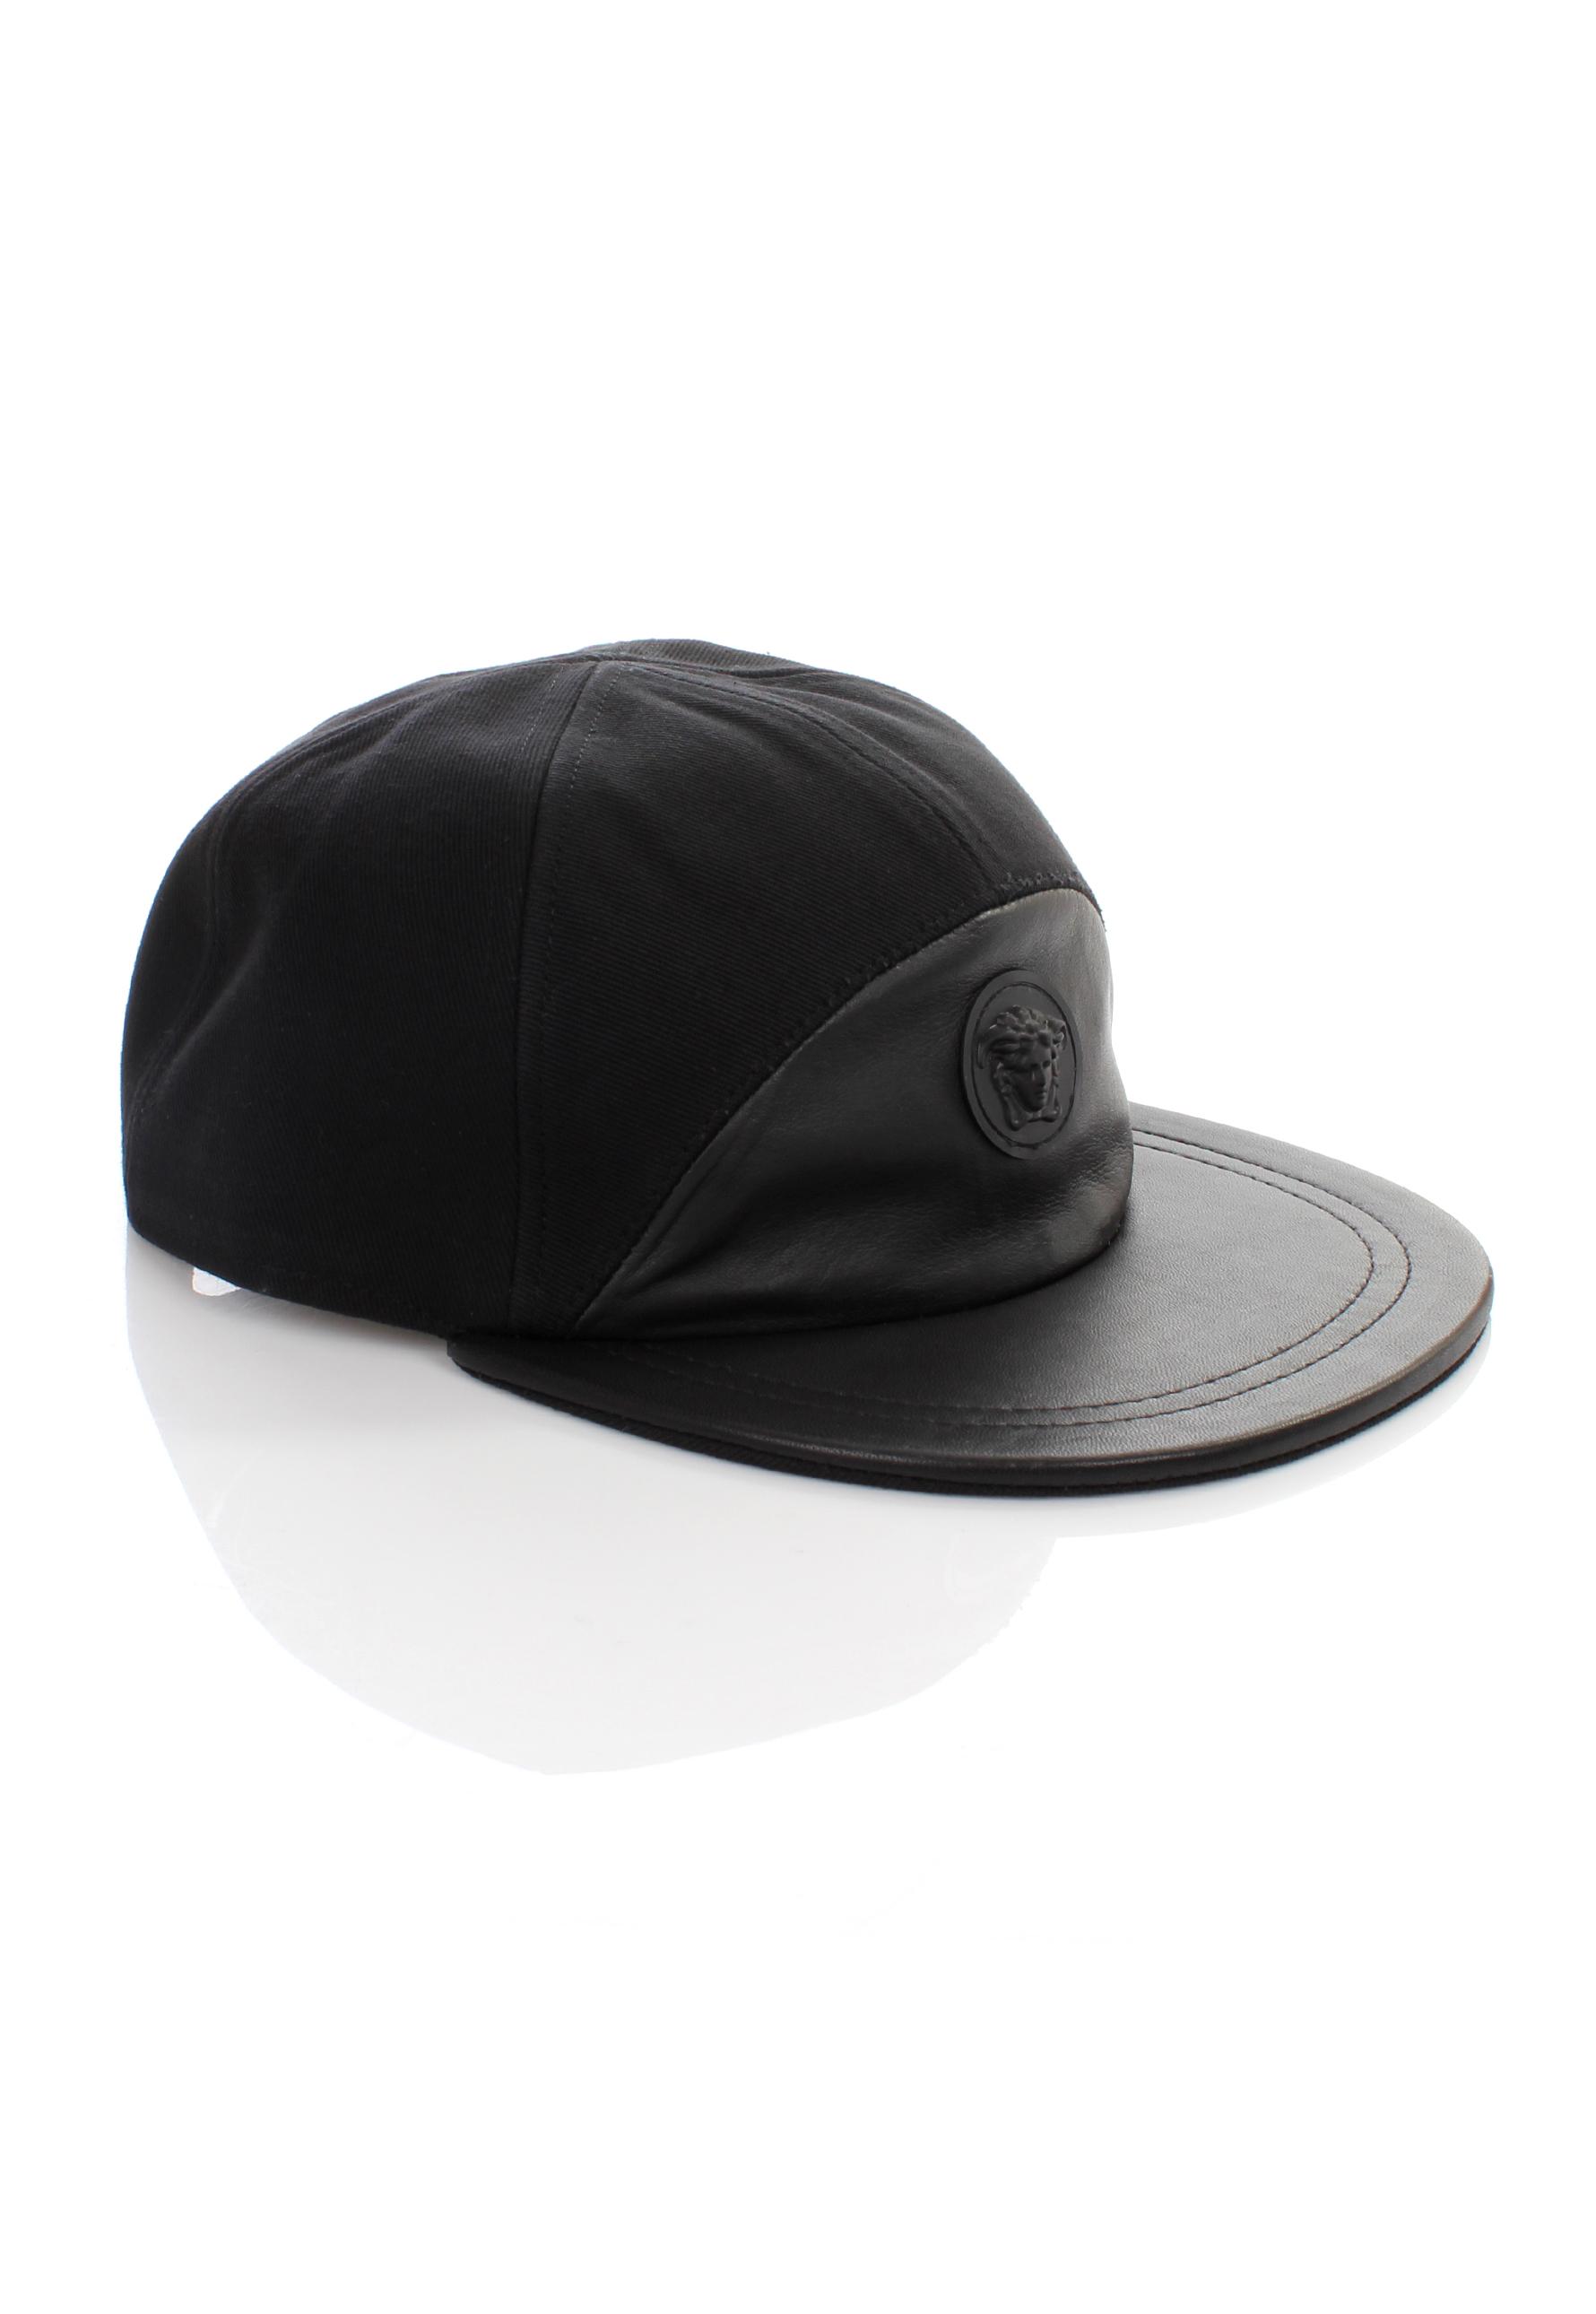 8f3d5a4811eb Lyst - Versace Medusa Logo Half Leather Cap Nero in Black for Men